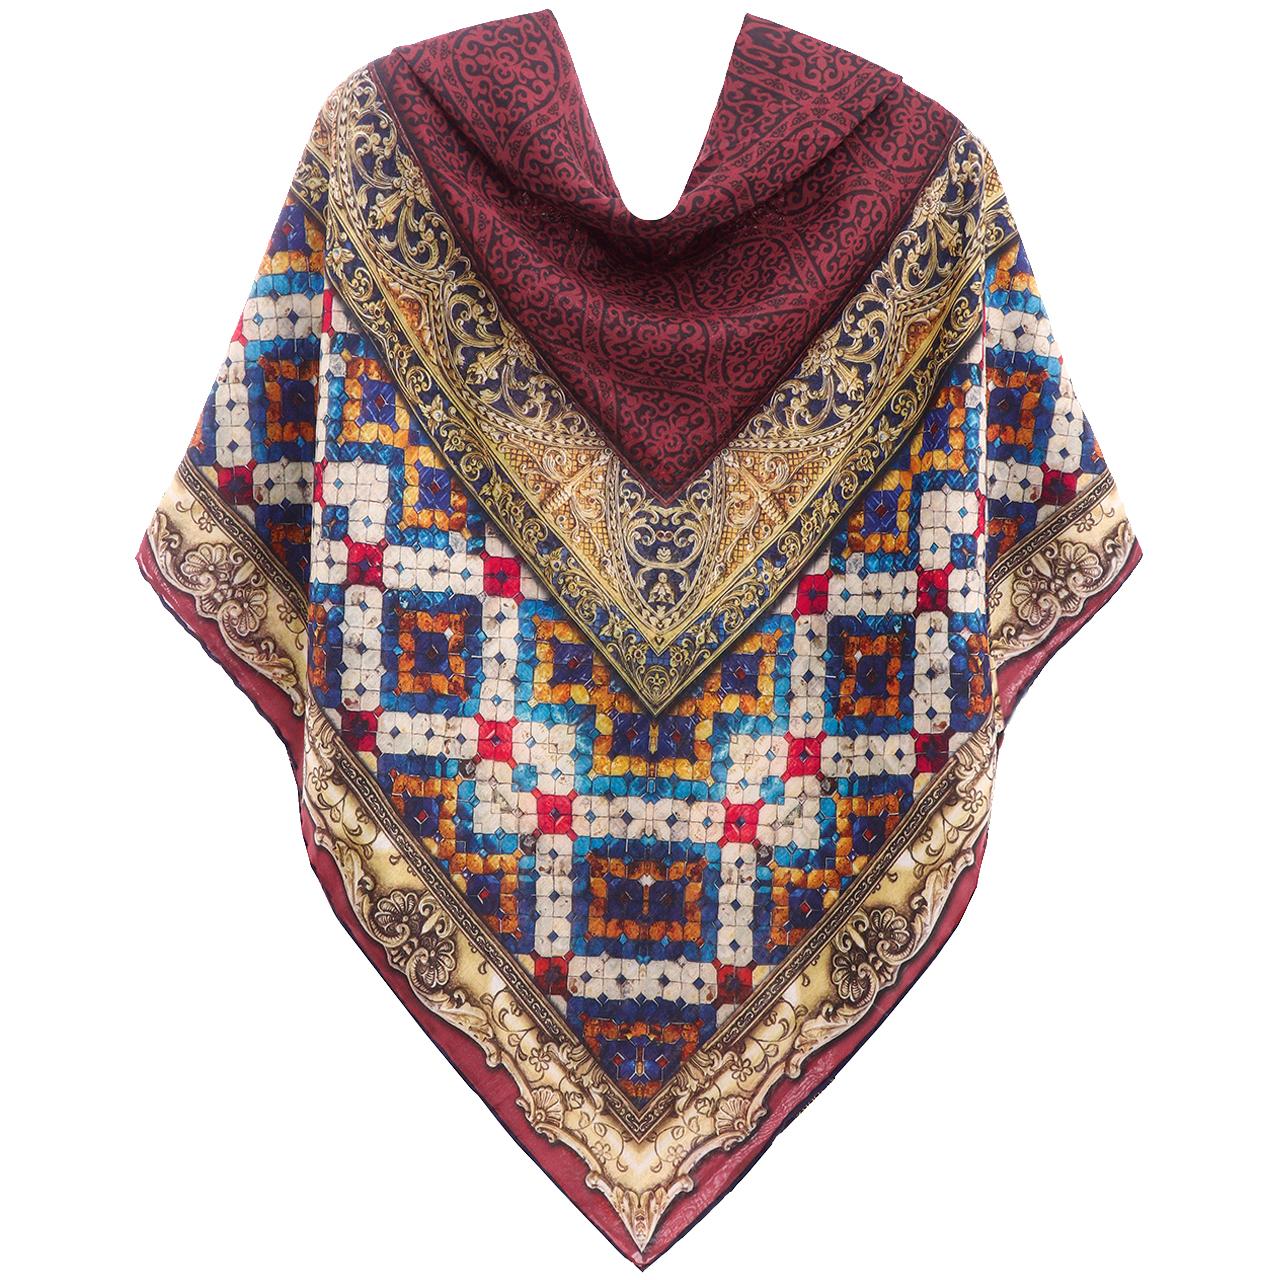 روسری زنانه کد tp-4261-46